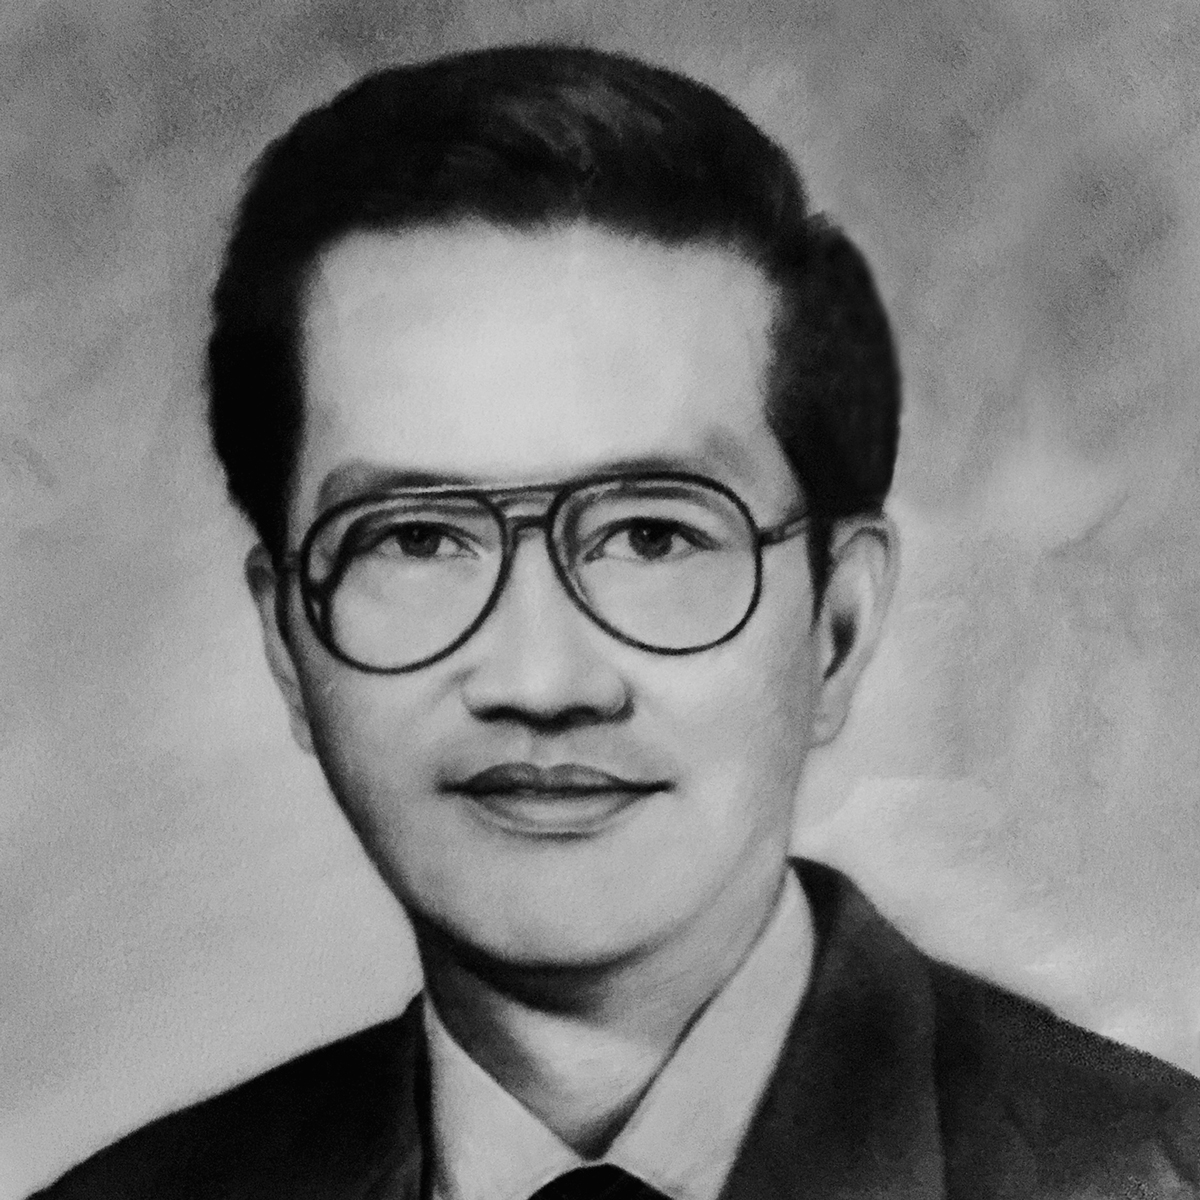 Francisco L. Benedicto